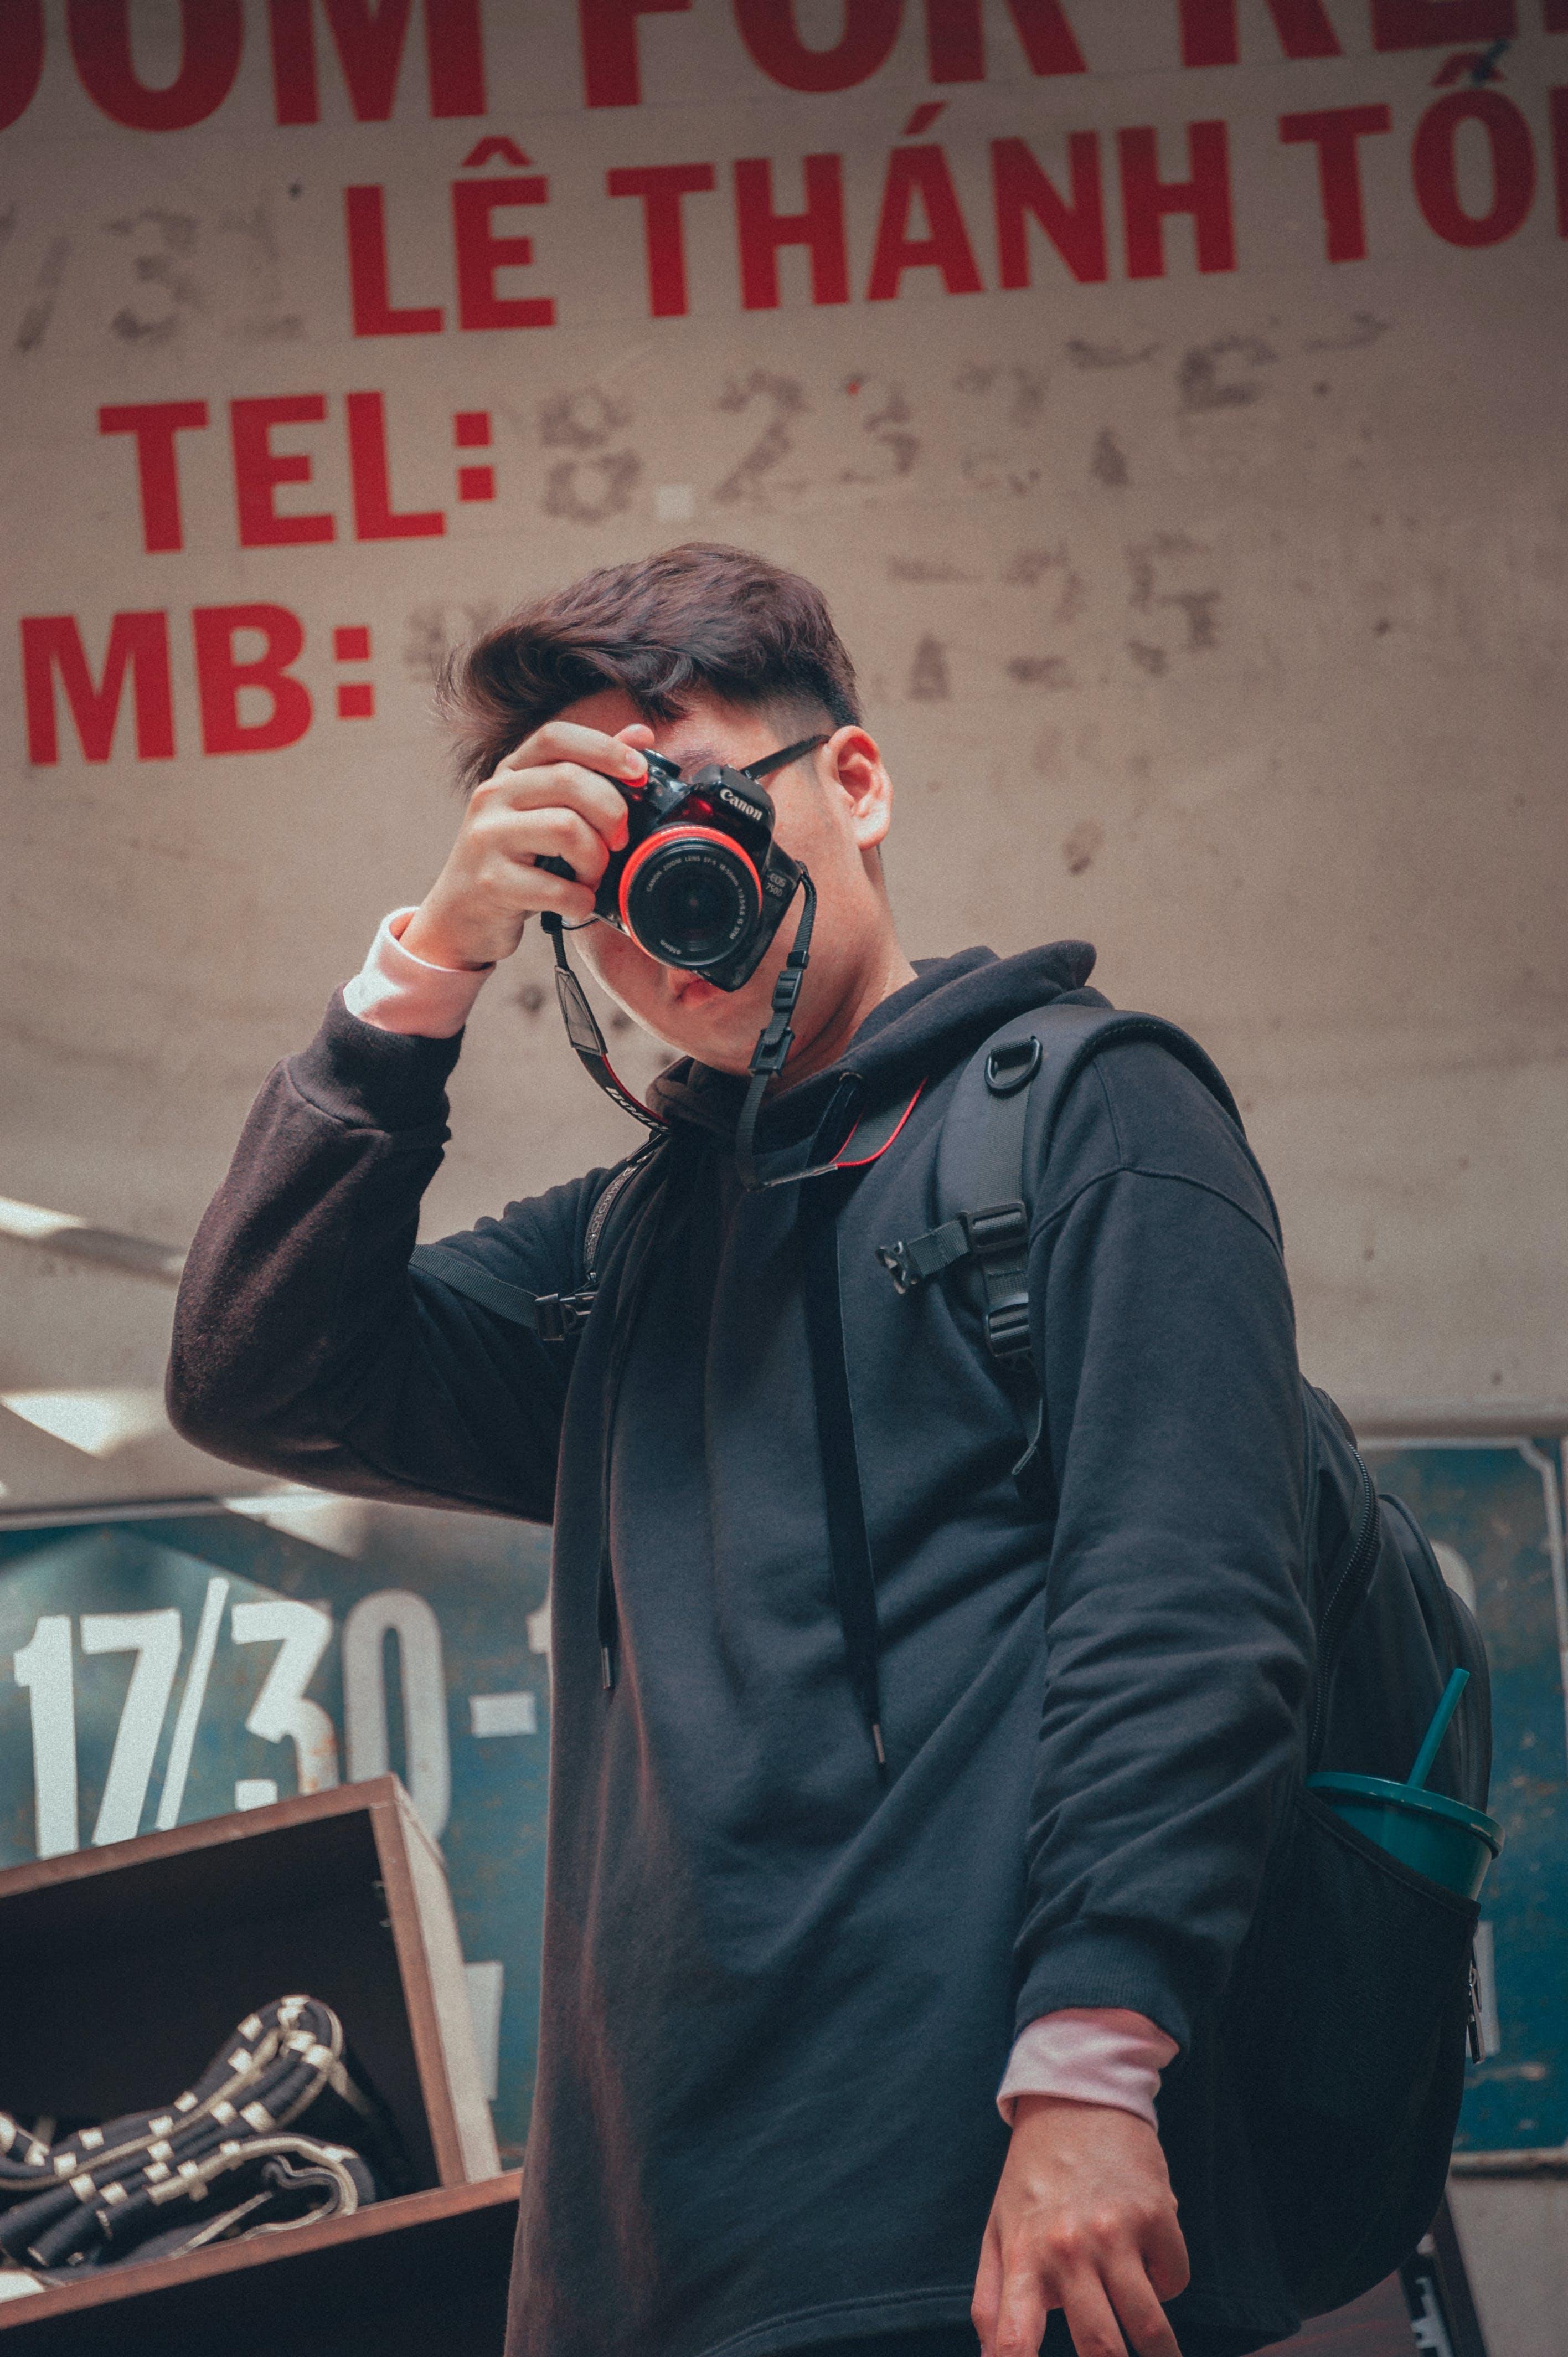 Kostenloses Stock Foto zu fashion, mann, person, kamera